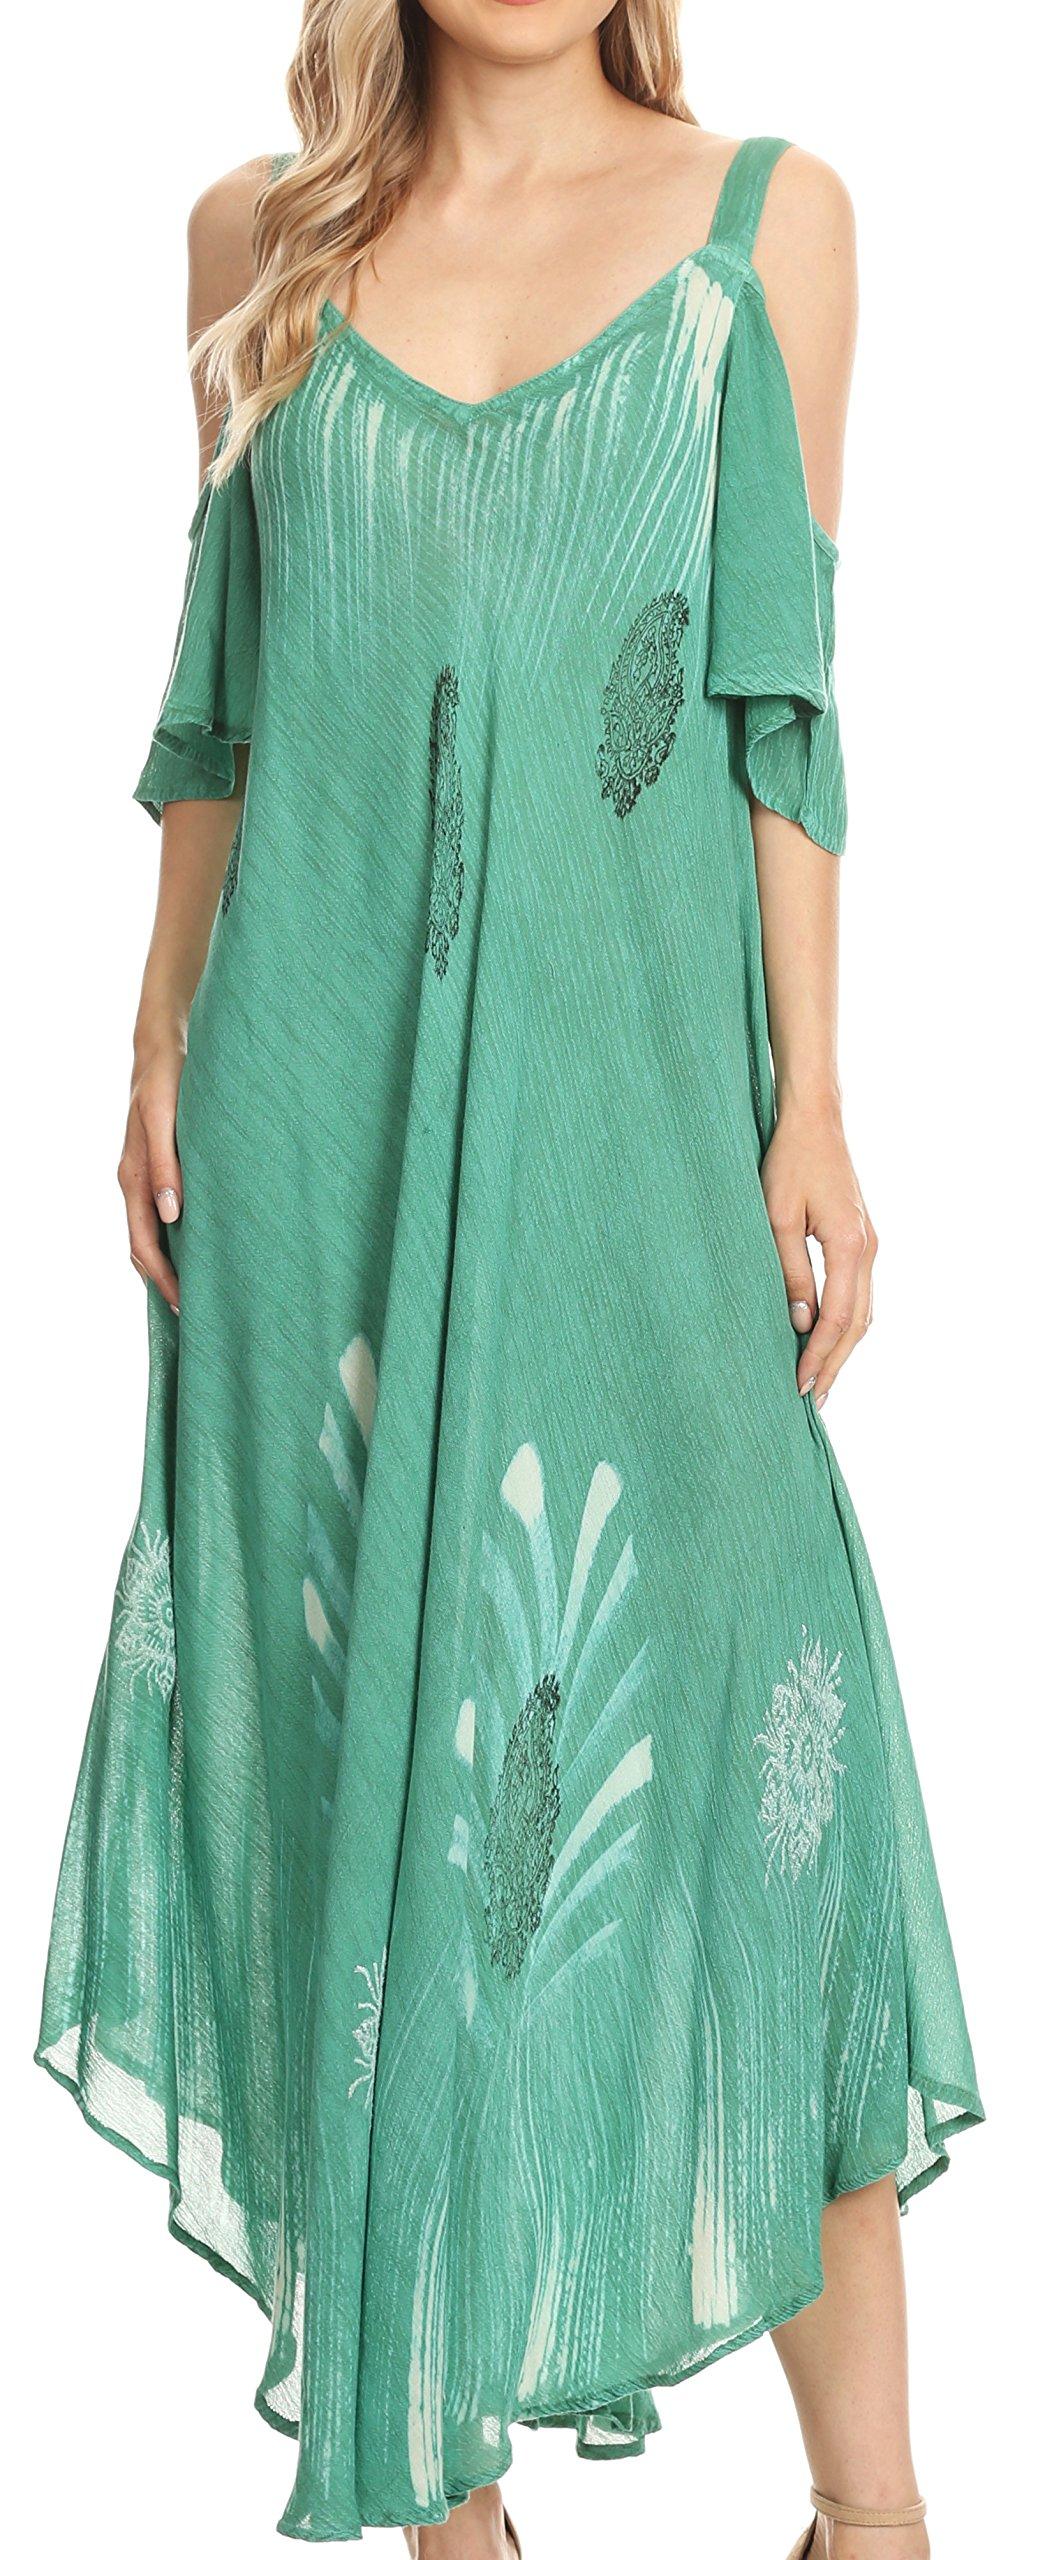 Sakkas 18155 - Renata Women's Cold Shoulder Maxi Caftan Dress Sundress Flare Stonewashed - Aqua - OS by Sakkas (Image #1)